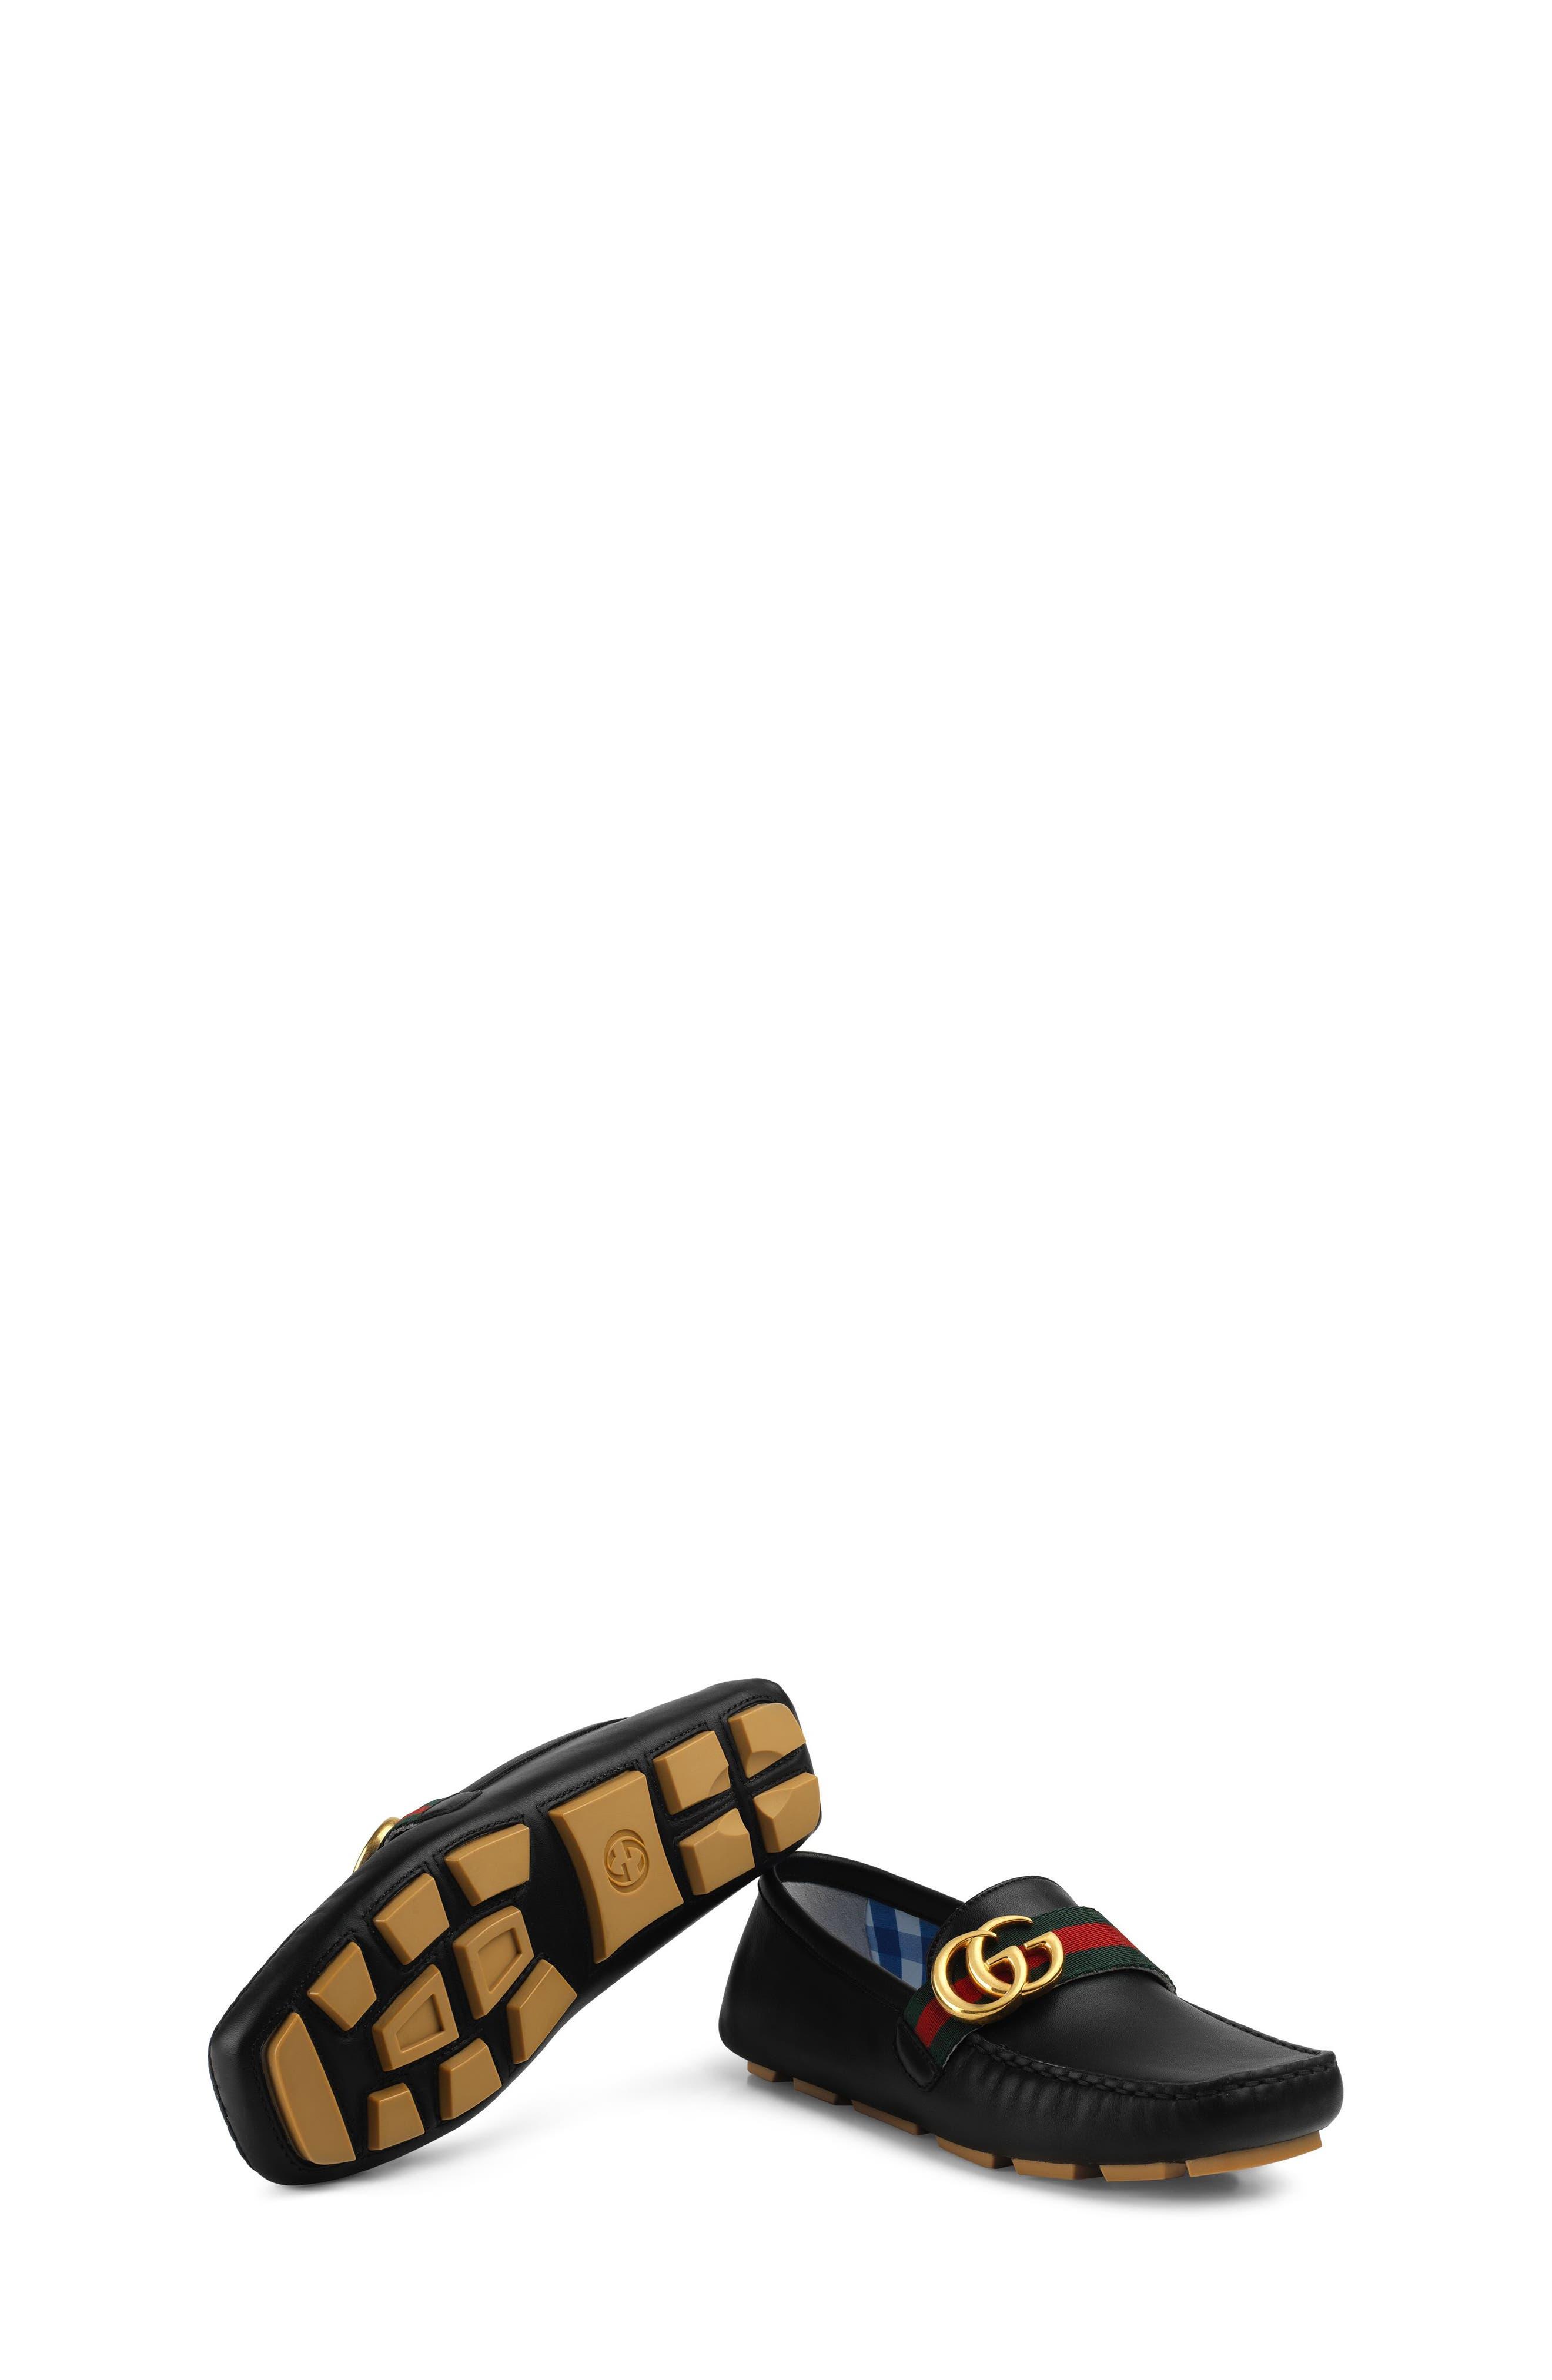 GUCCI, Noel Driving Loafer, Alternate thumbnail 6, color, BLACK